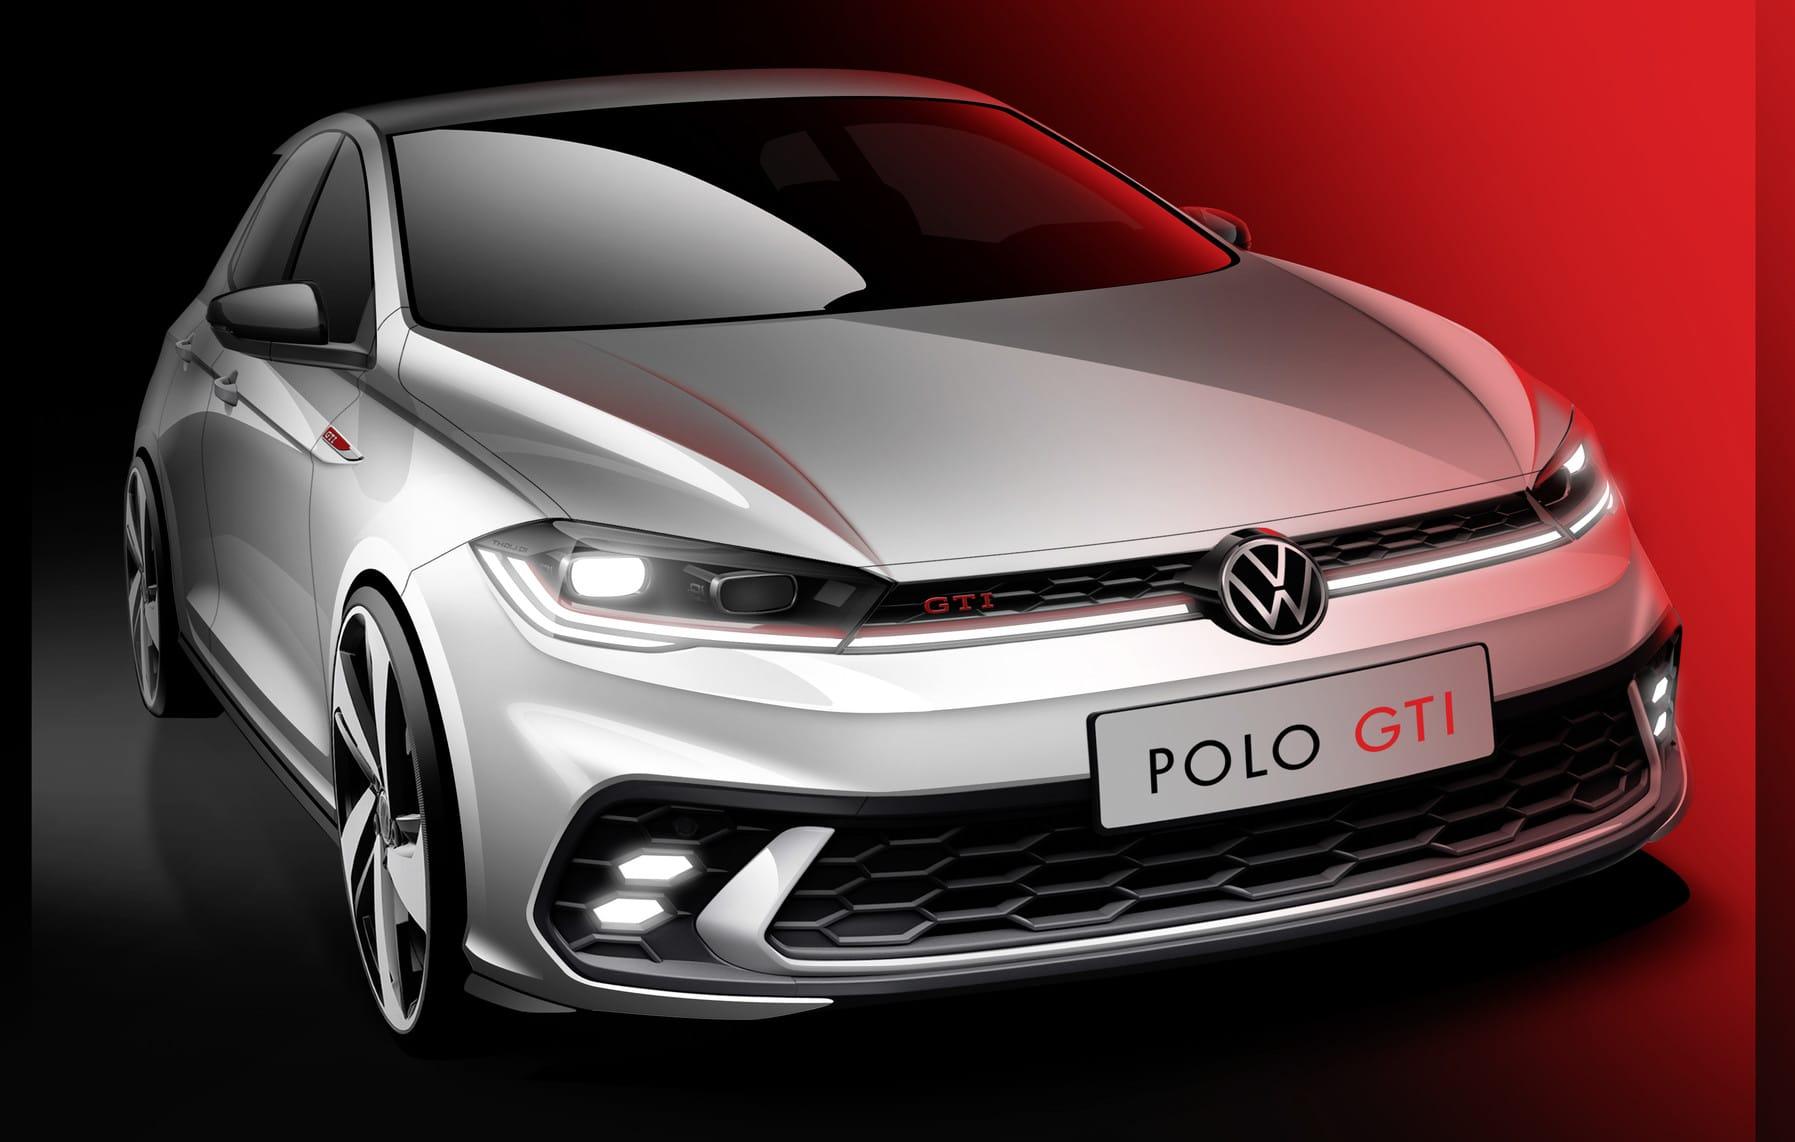 Volkswagen Polo GTI skica 2021